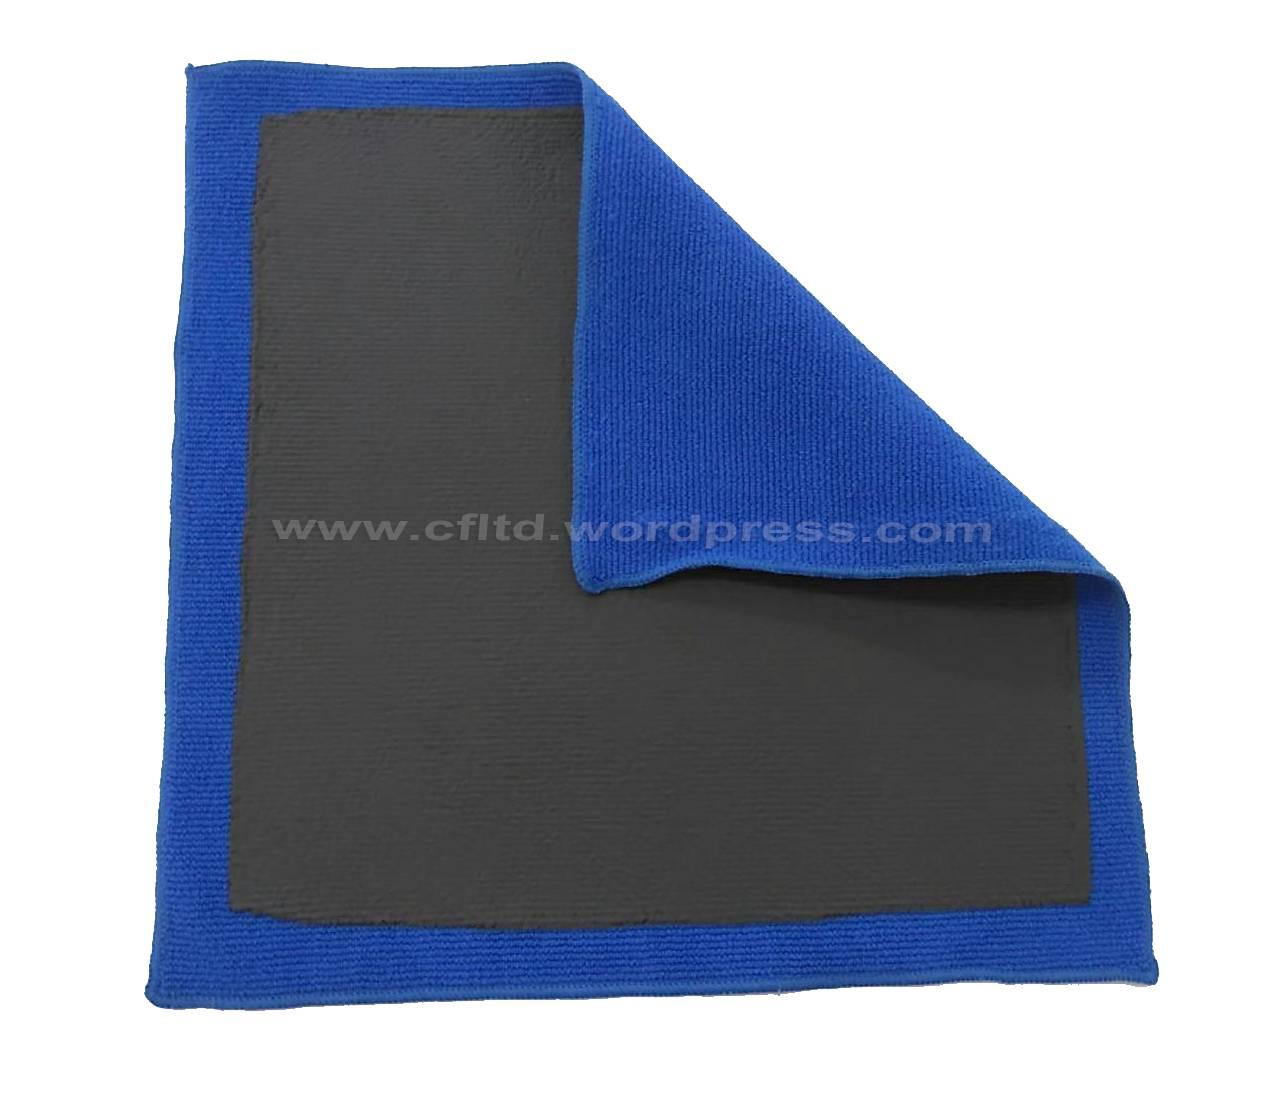 Microfiber Clay Towel